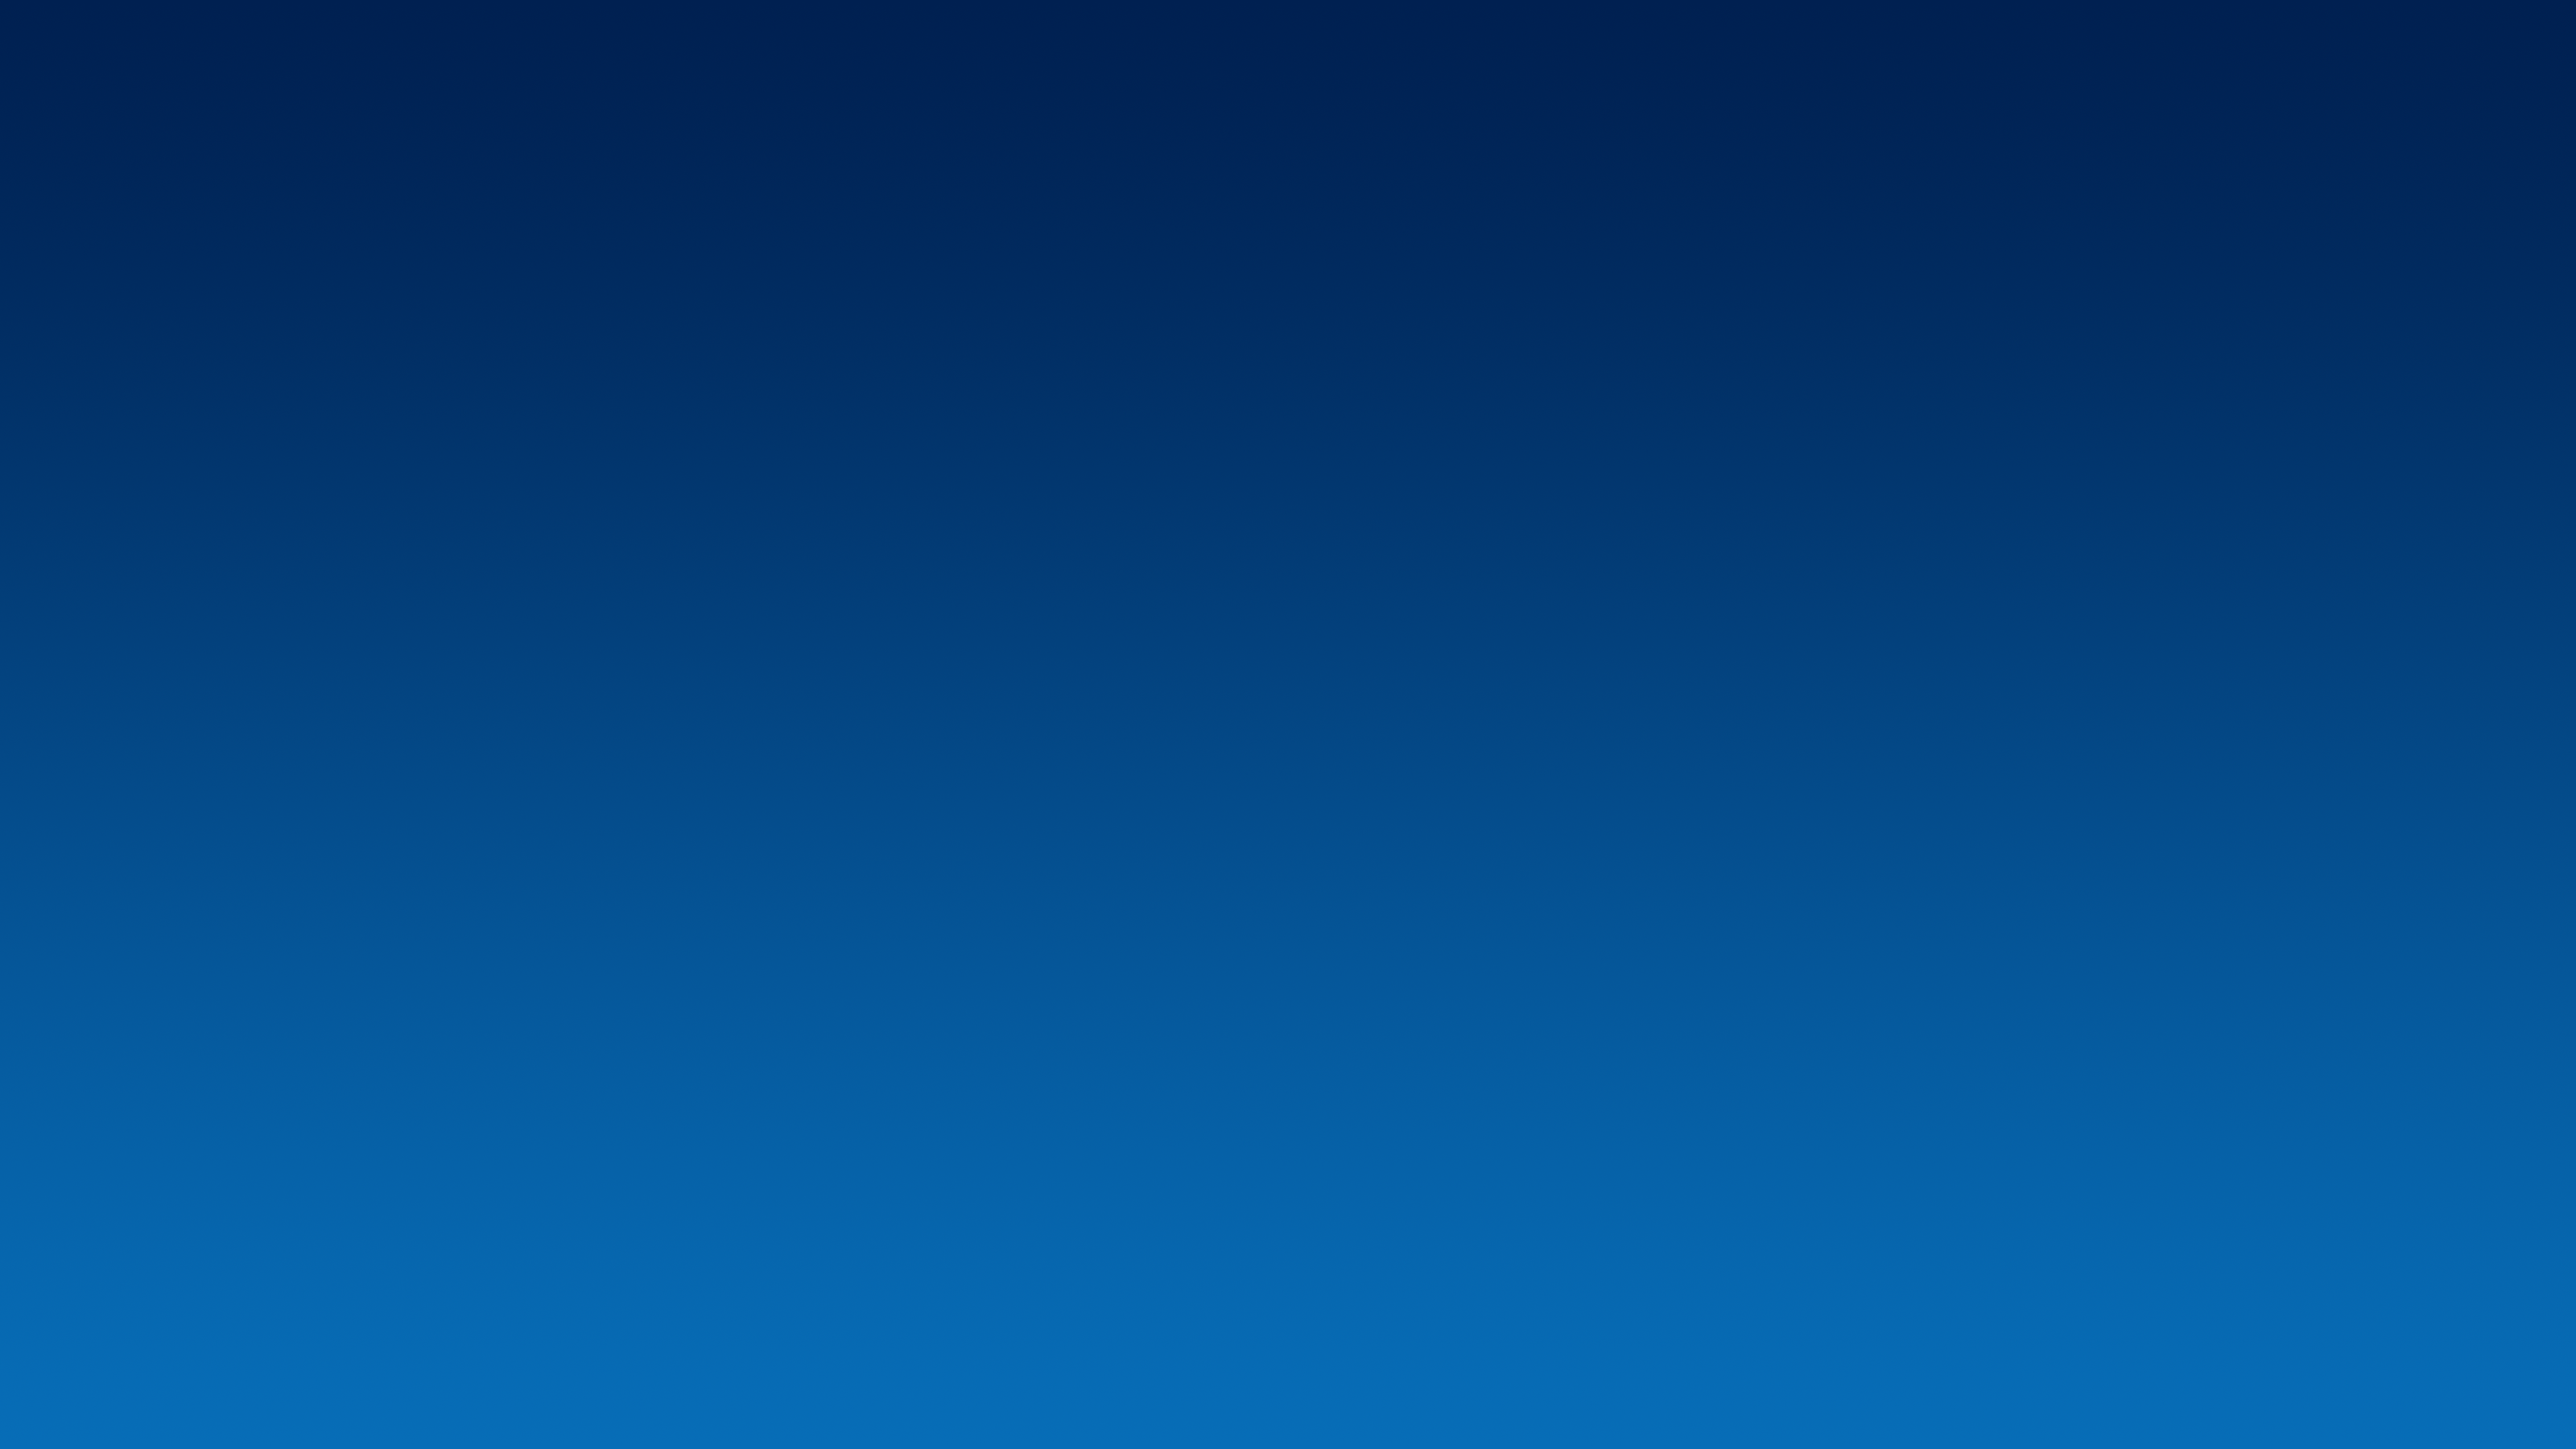 49 Windows 10 Wallpaper 3200x1800 On Wallpapersafari